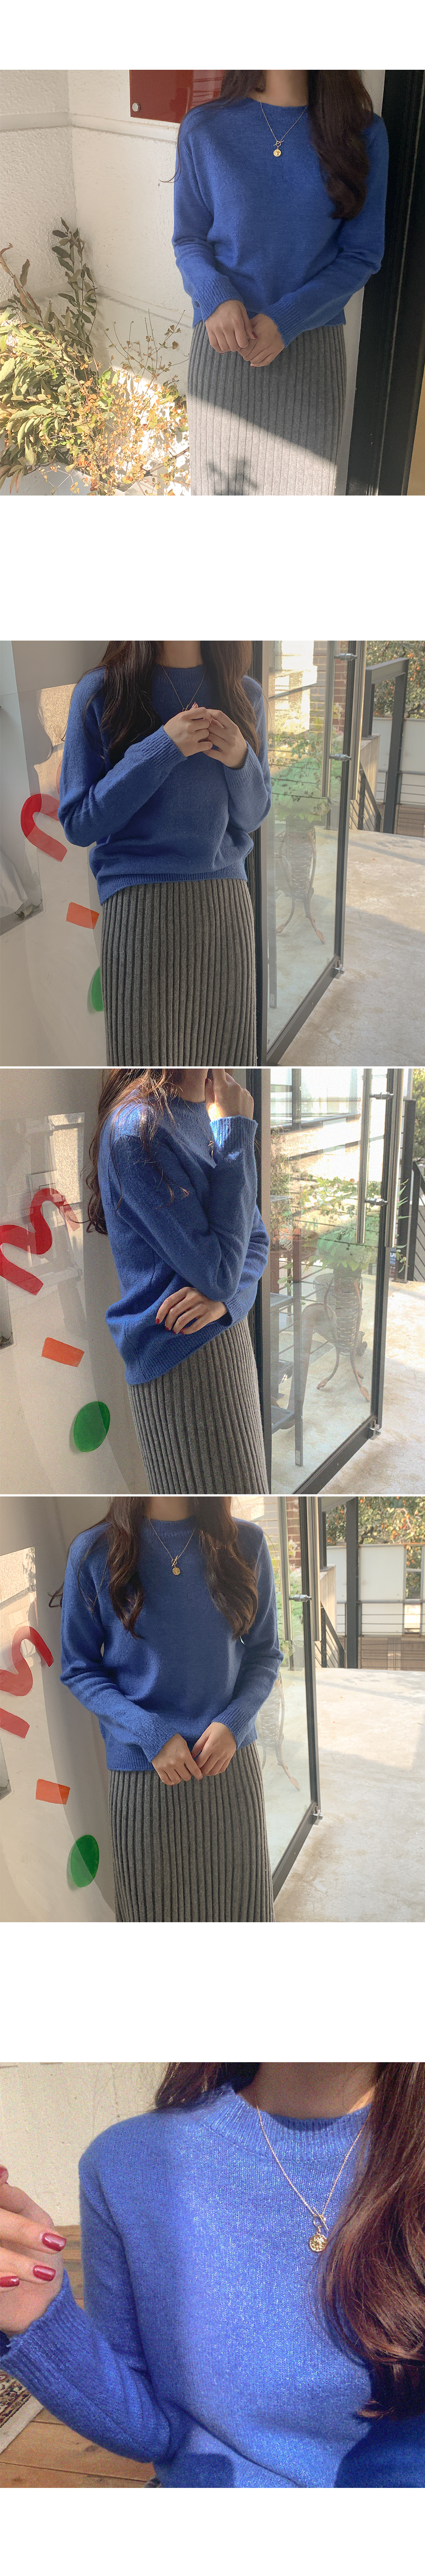 Ruai round knit